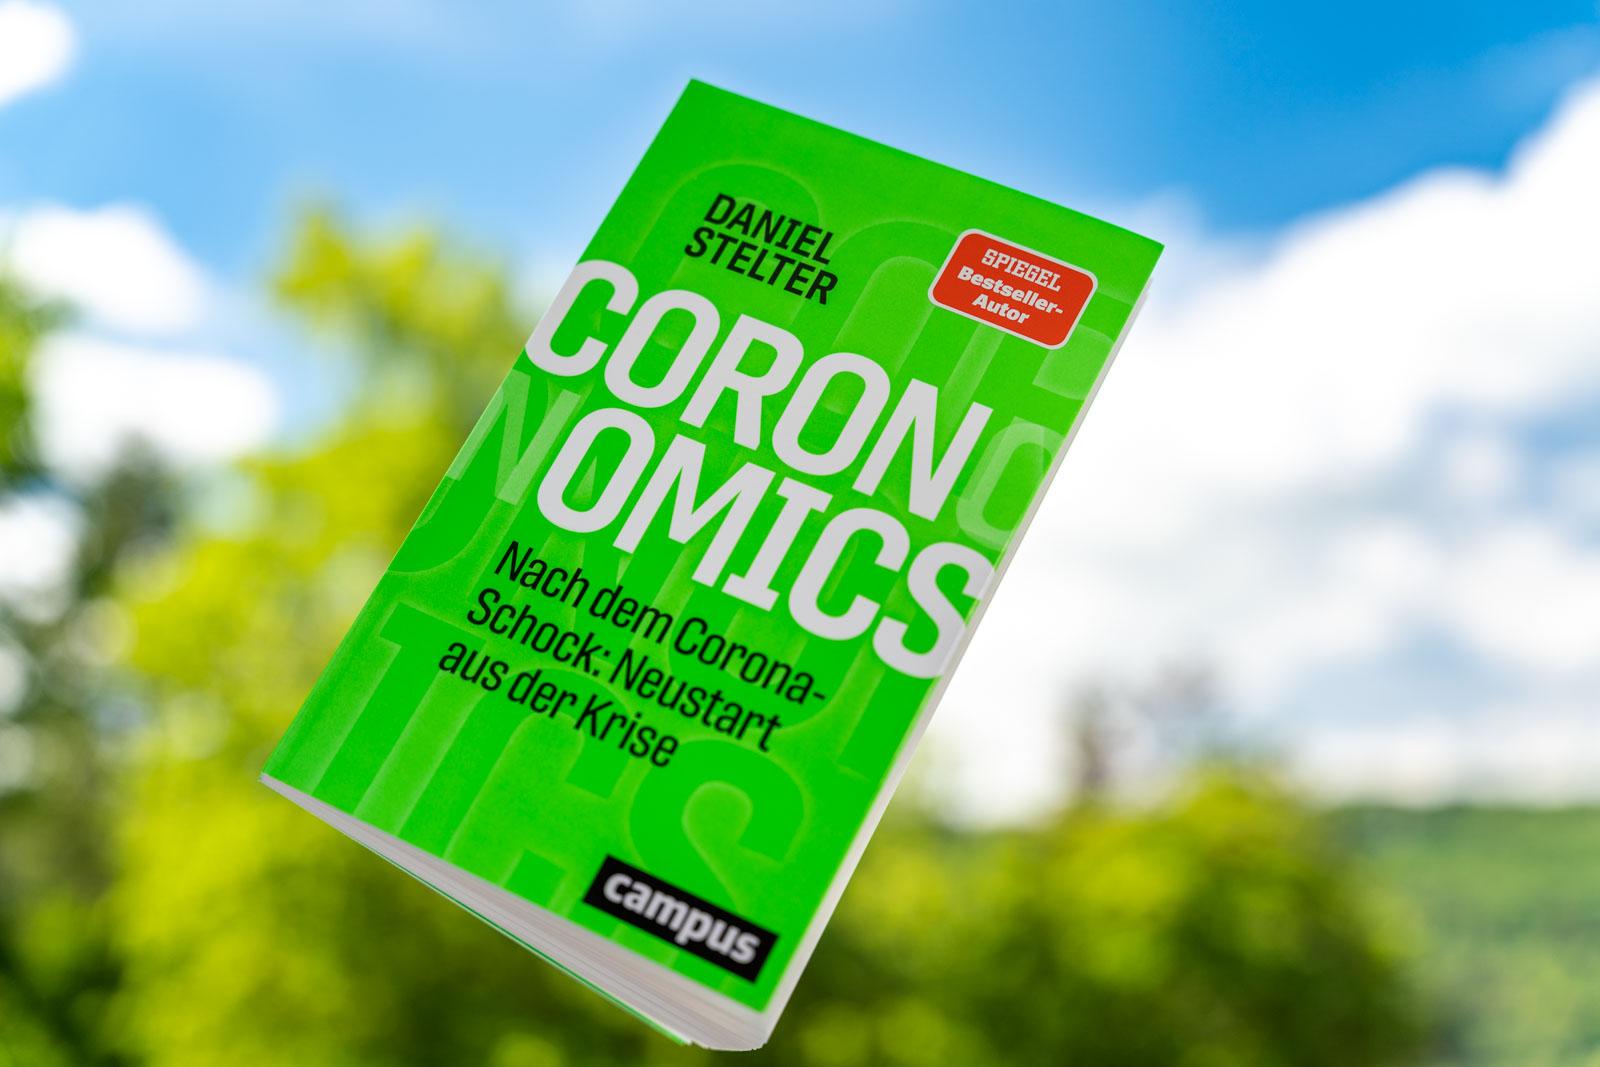 coronomics Daniel Stelter